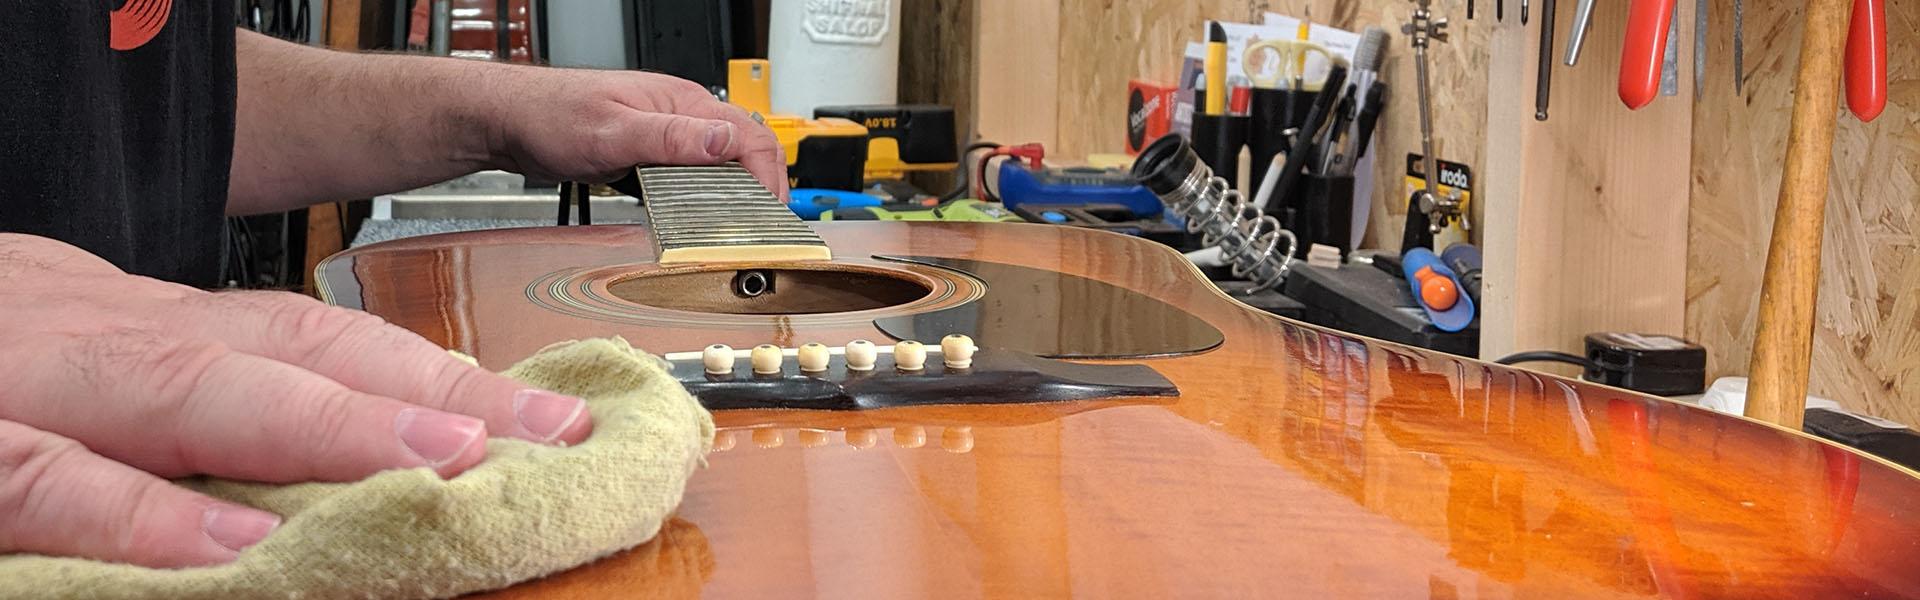 Shire Guitars